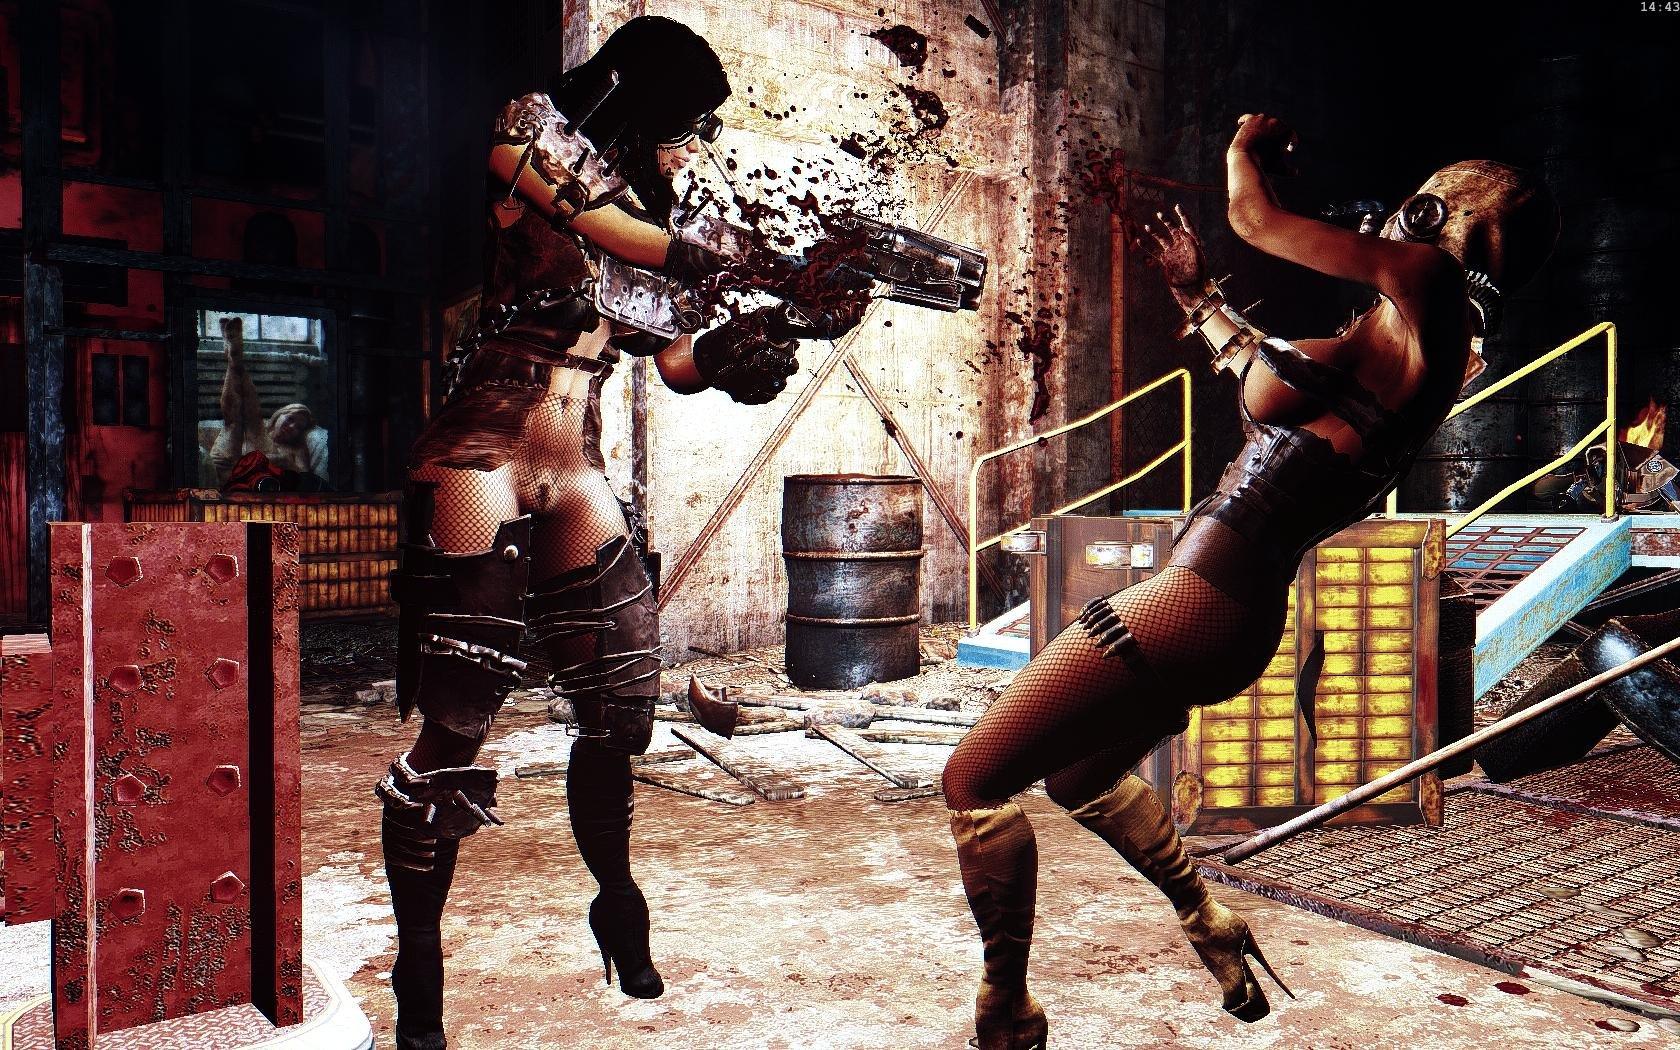 Fallout4 2019-01-05 14-43-41-56